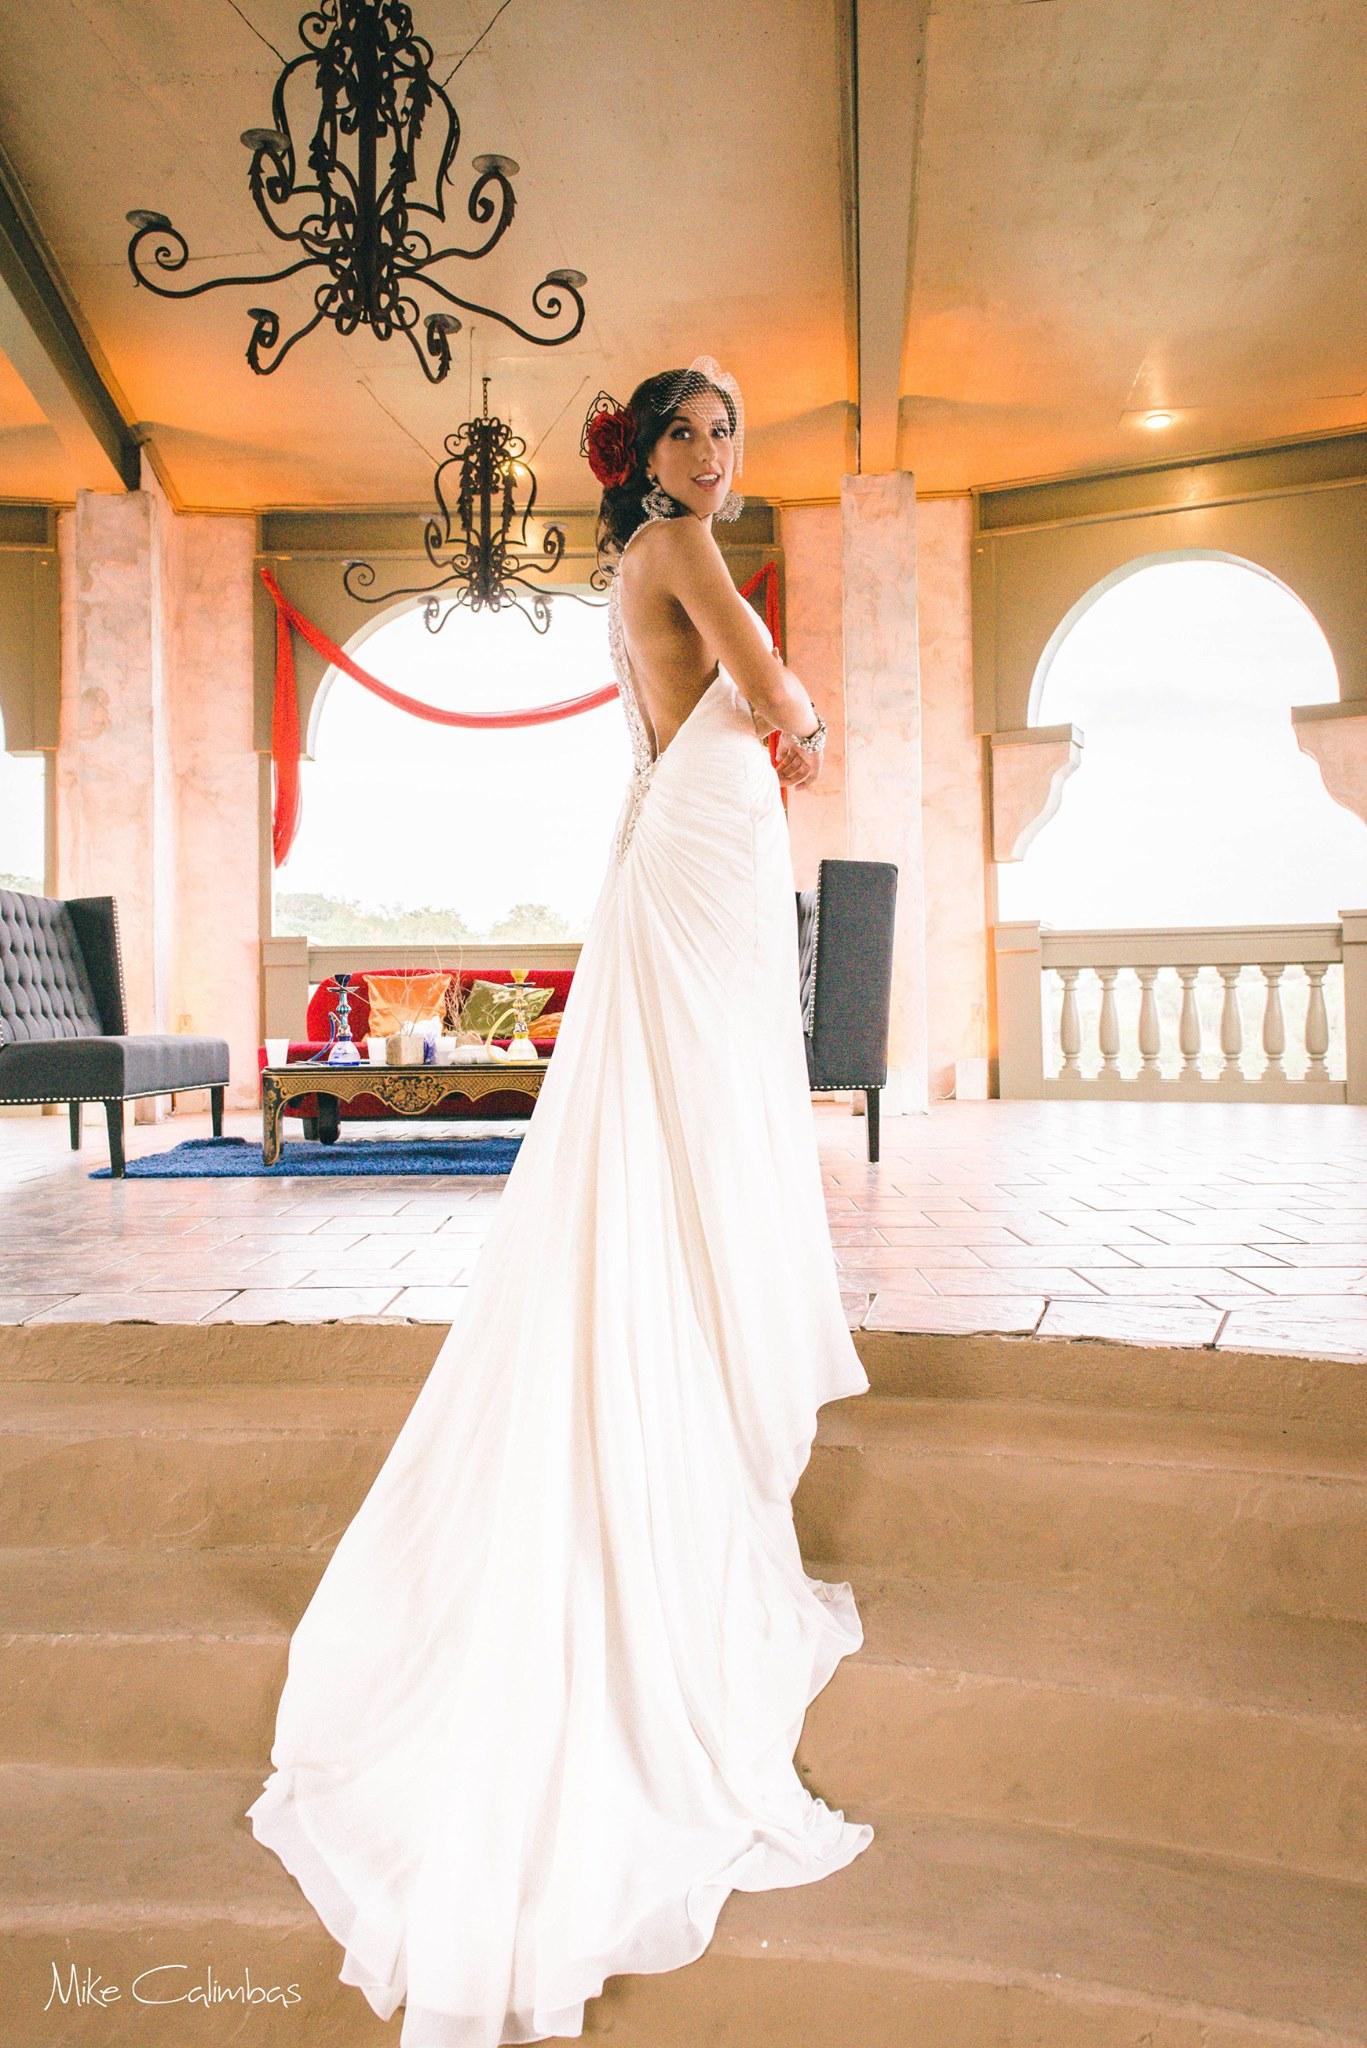 Breathtaking Bride - Raphaella